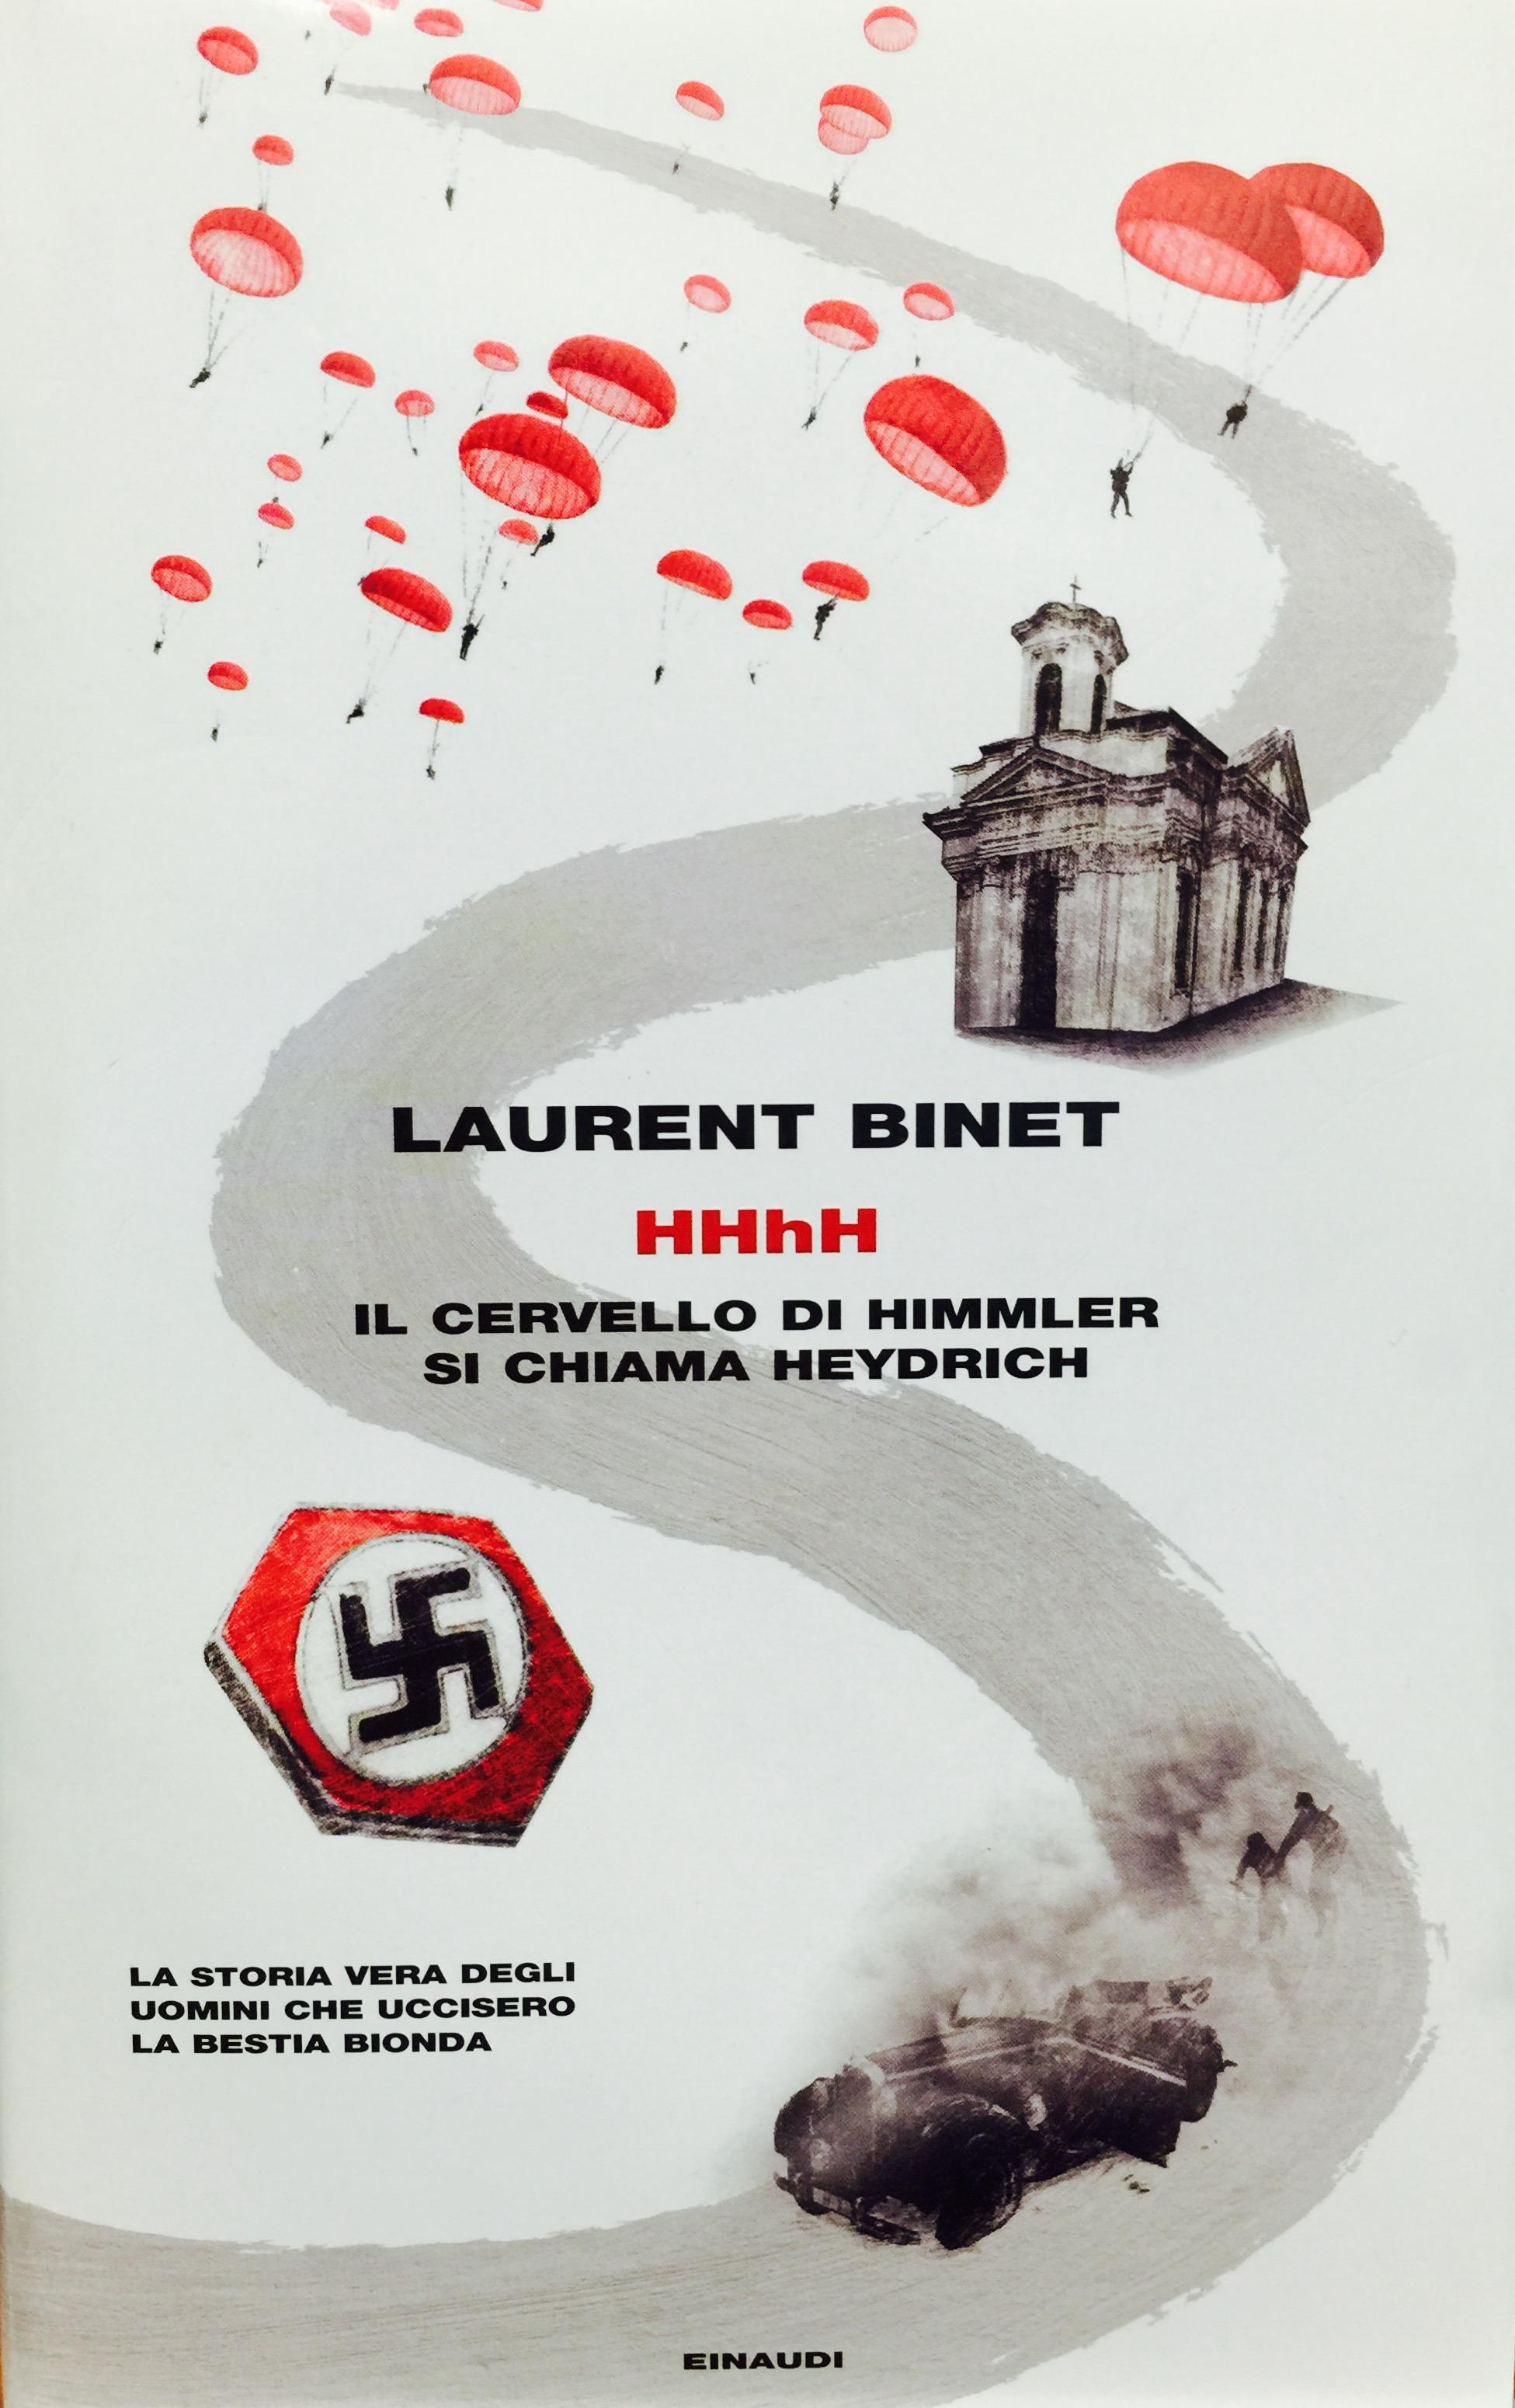 Laurent Binet, HHhH, Einaudi